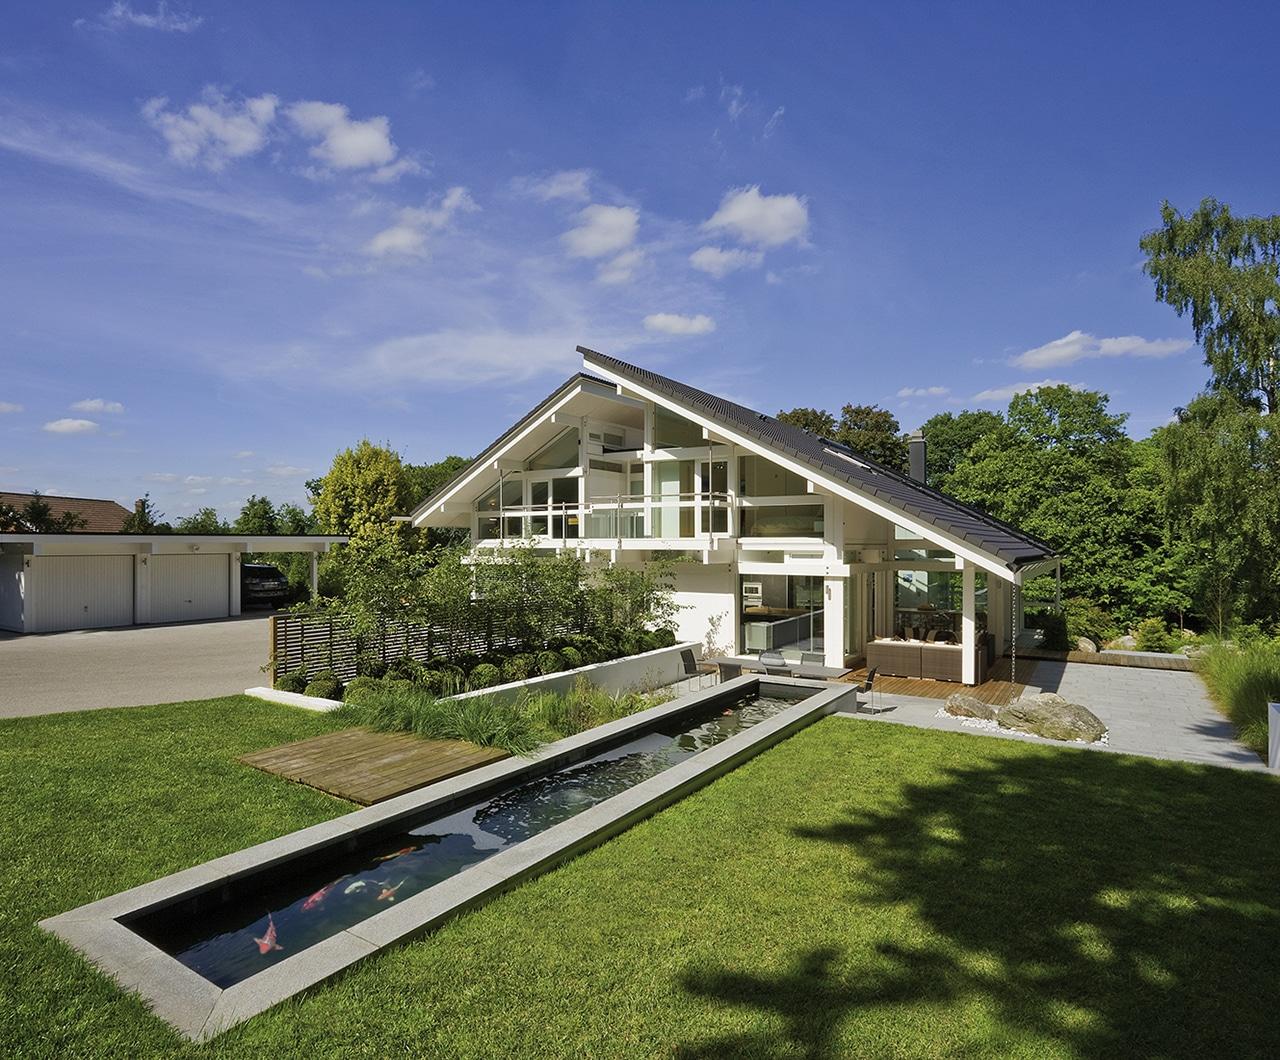 garden design in great missenden north berkshire. Black Bedroom Furniture Sets. Home Design Ideas